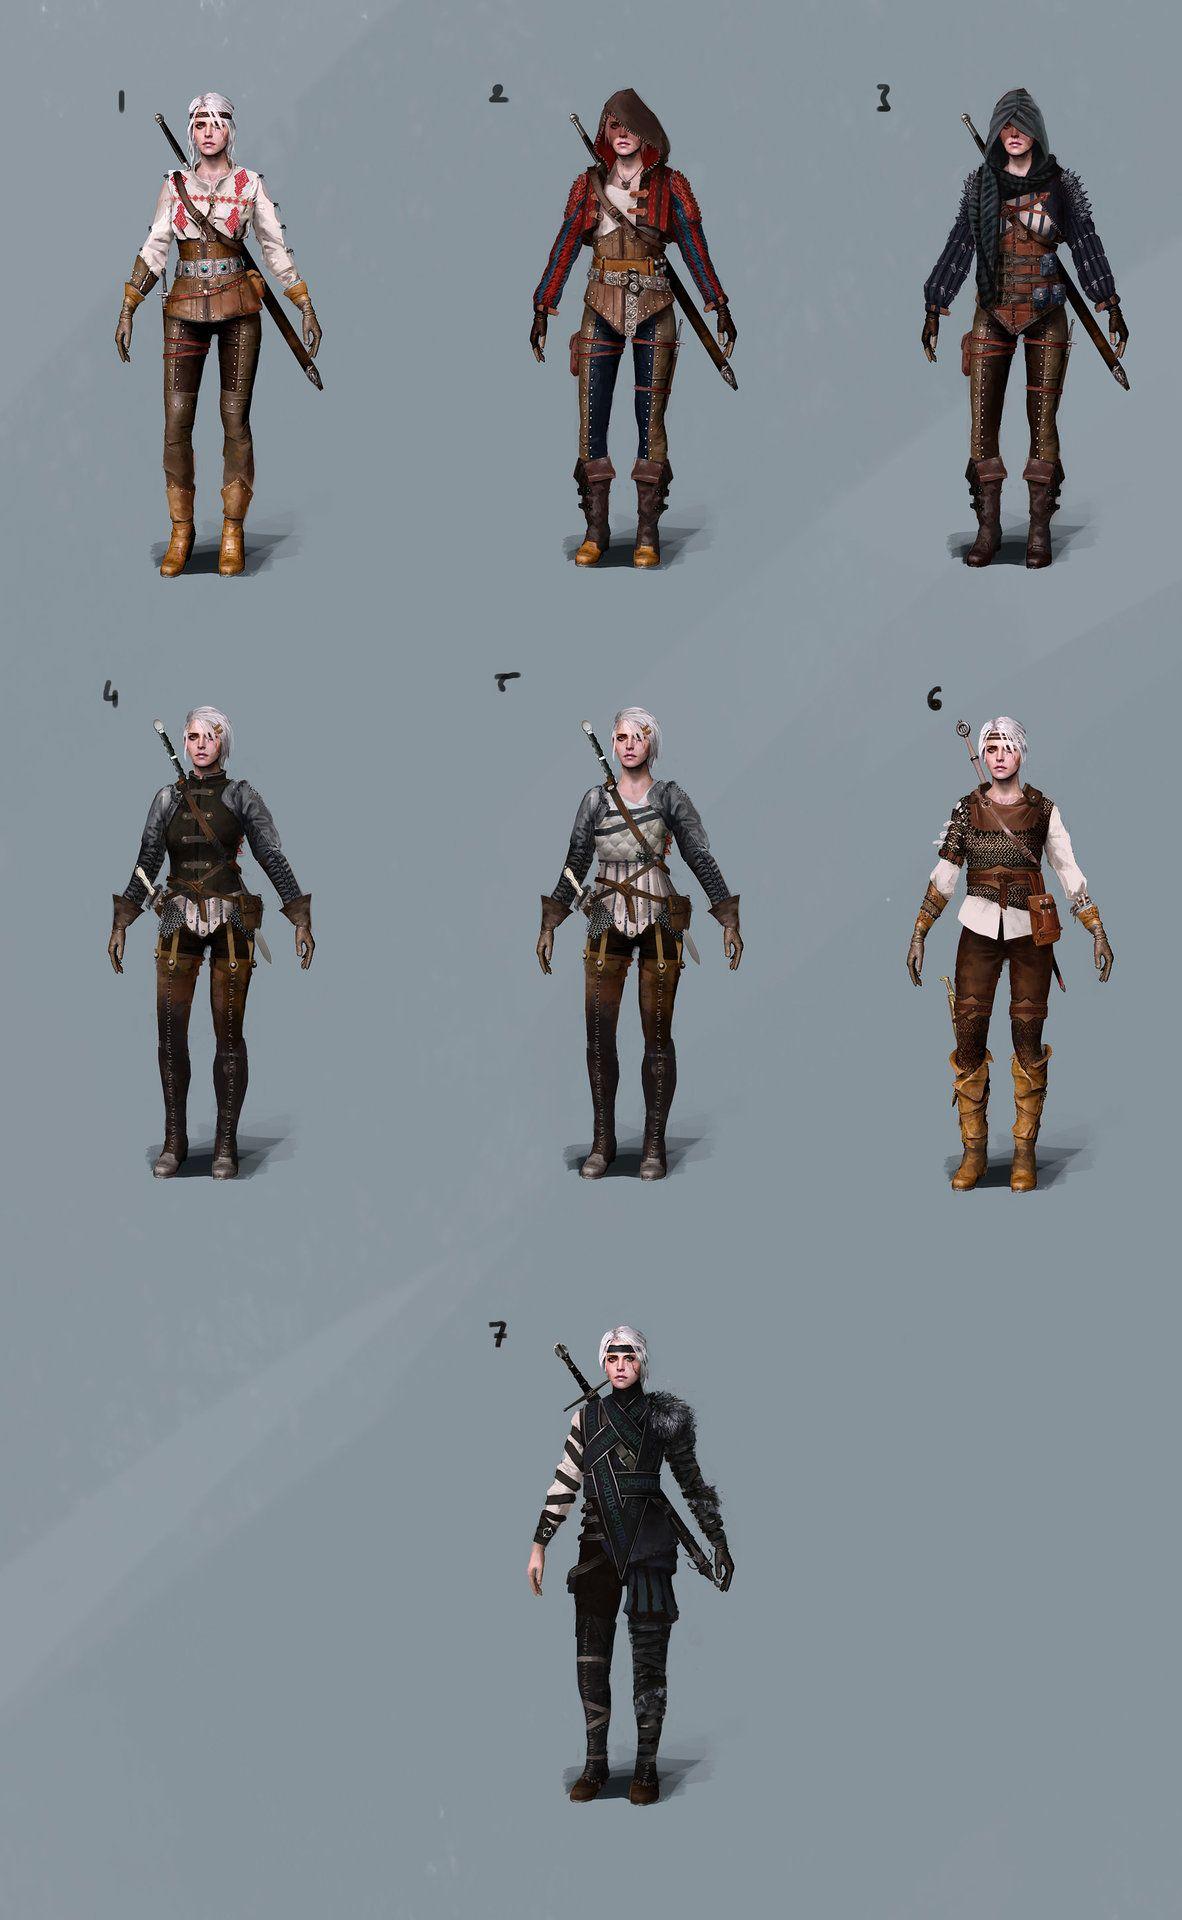 The Witcher 3 Ciri Concept Art